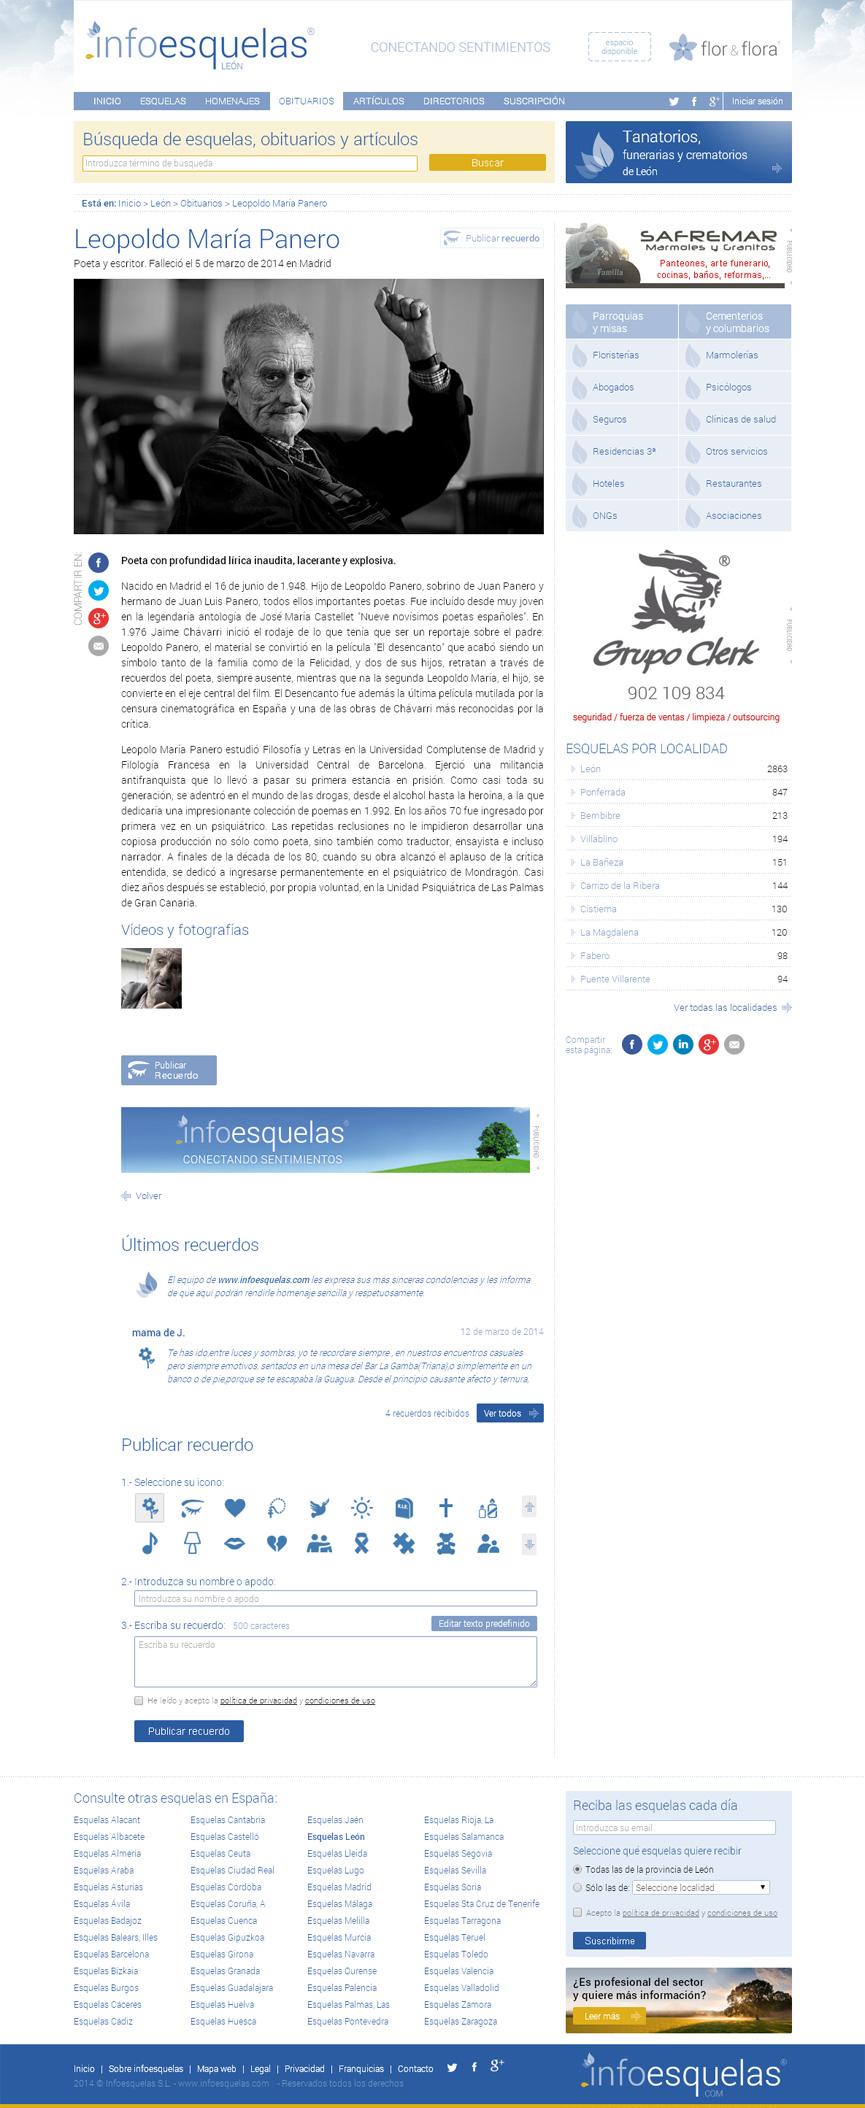 Infoesquelas_info4